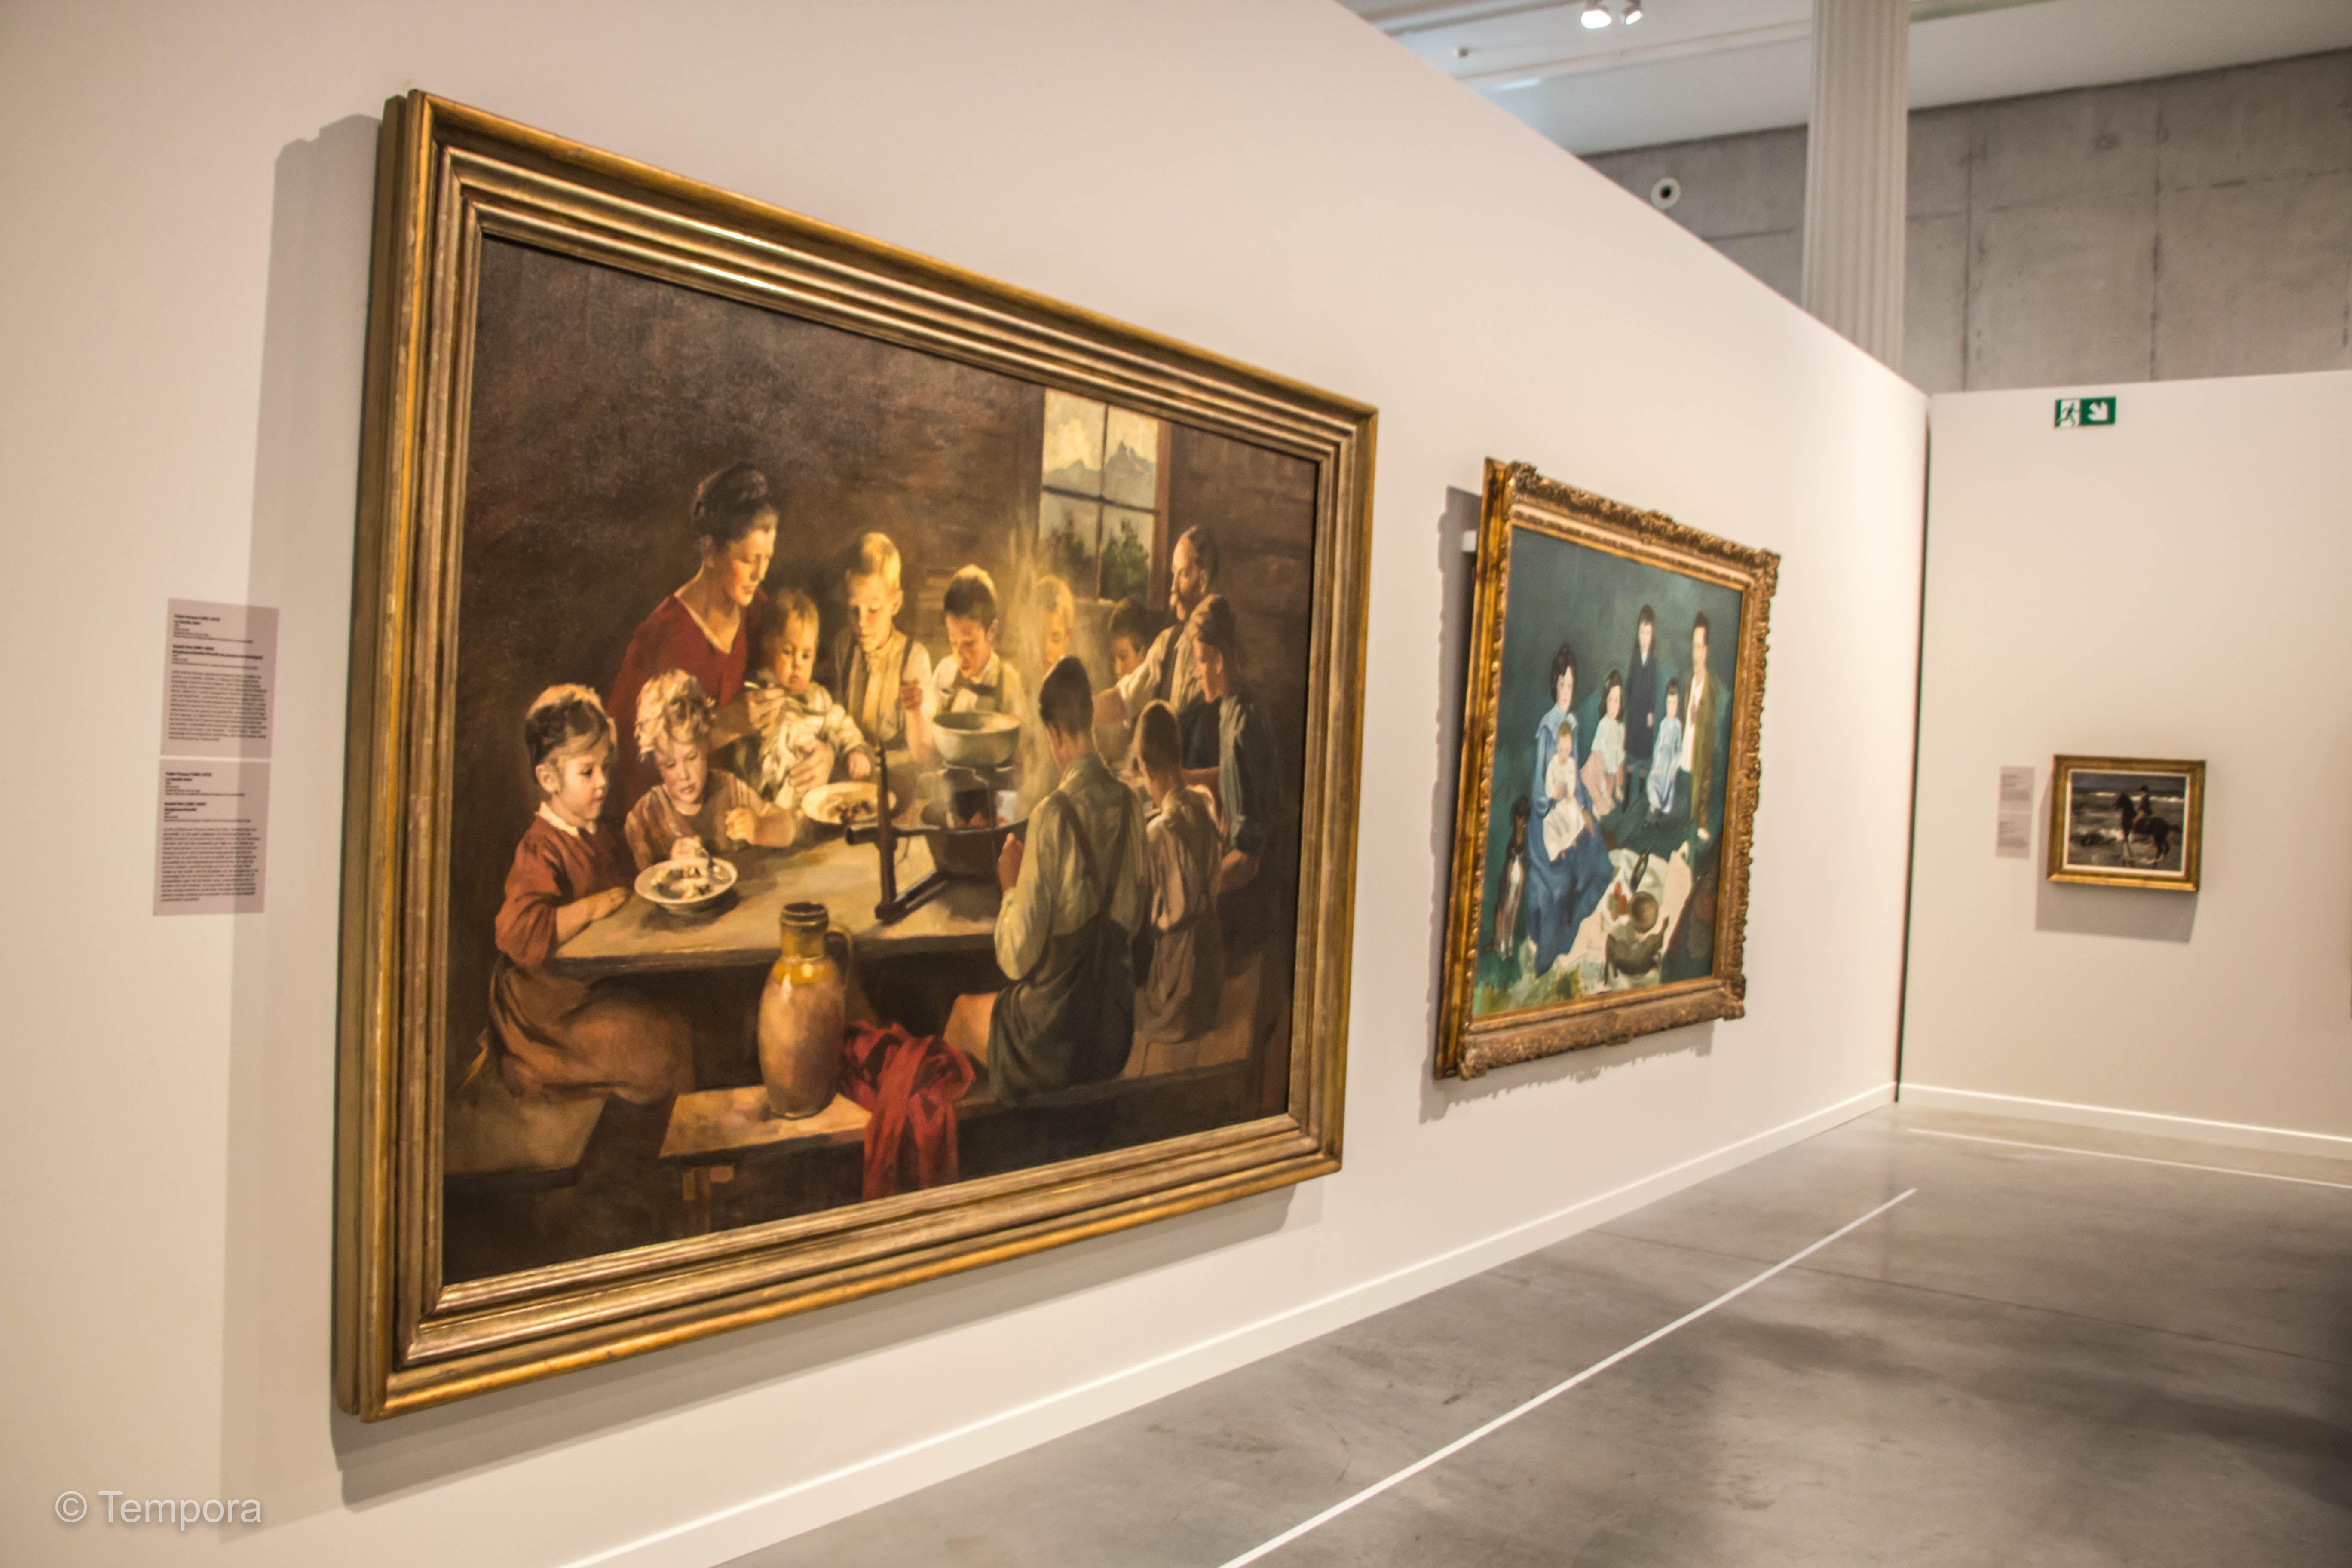 #Exhibition #Art #Painter #Gauguin #Picasso #Braque #Leger #Laurencin #Matisse #Painting #Liege #LaBoverie #Belgium